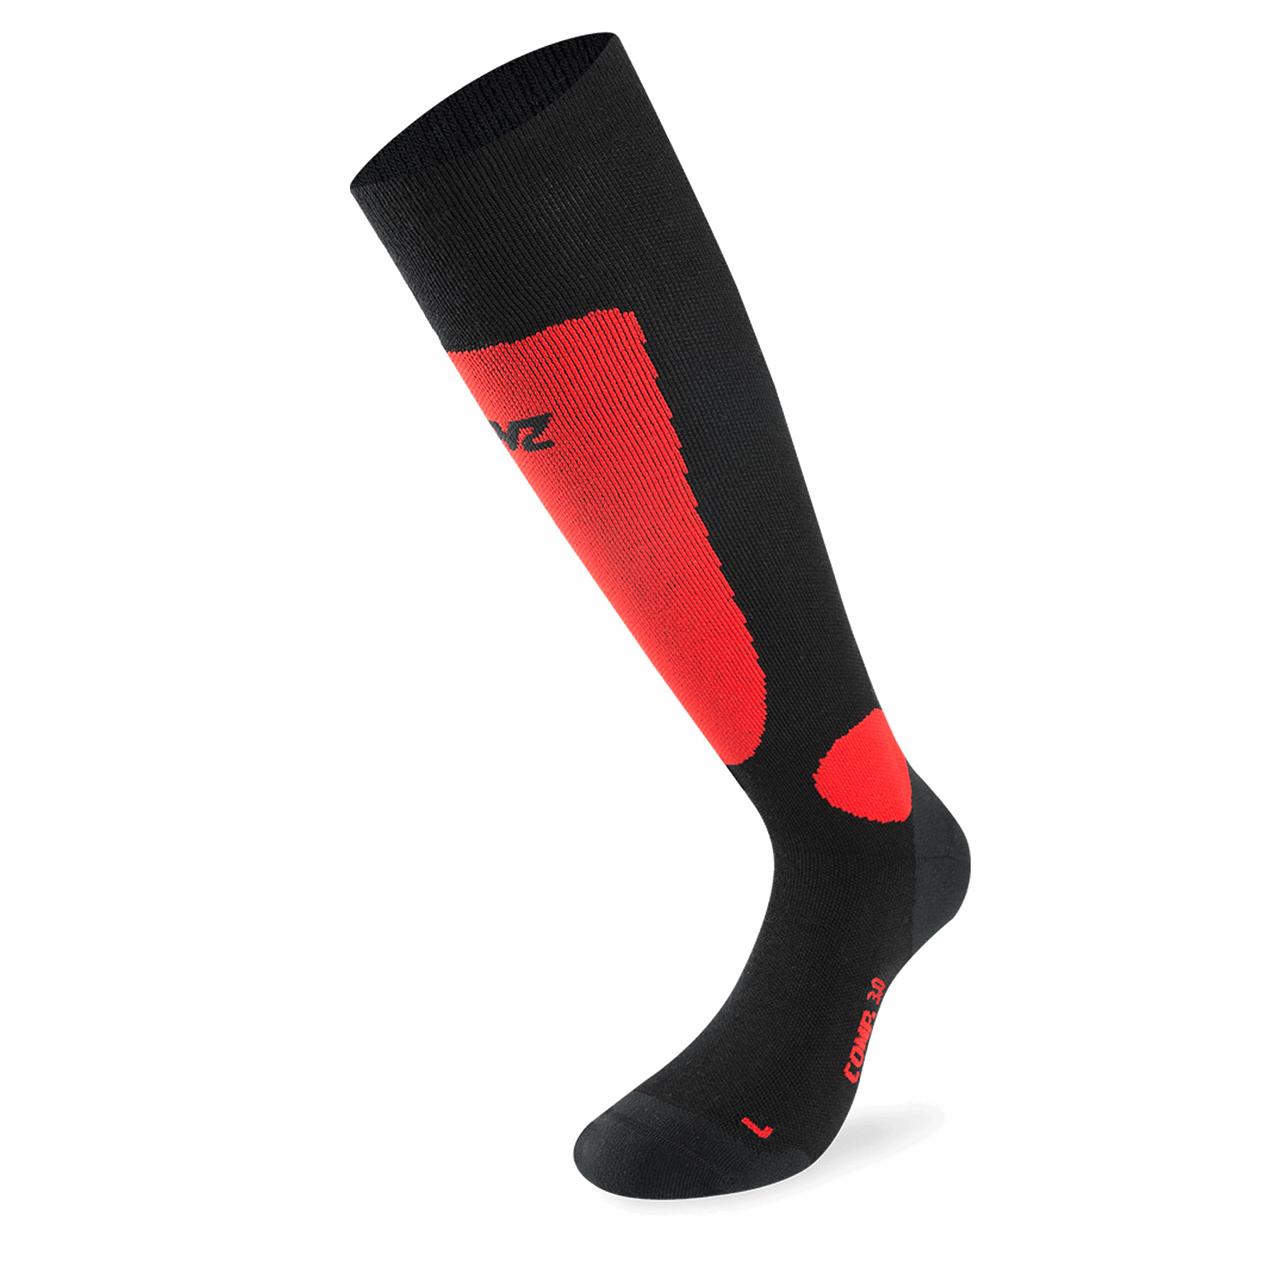 جوراب لنز مدل Compression socks 3.0 Merino